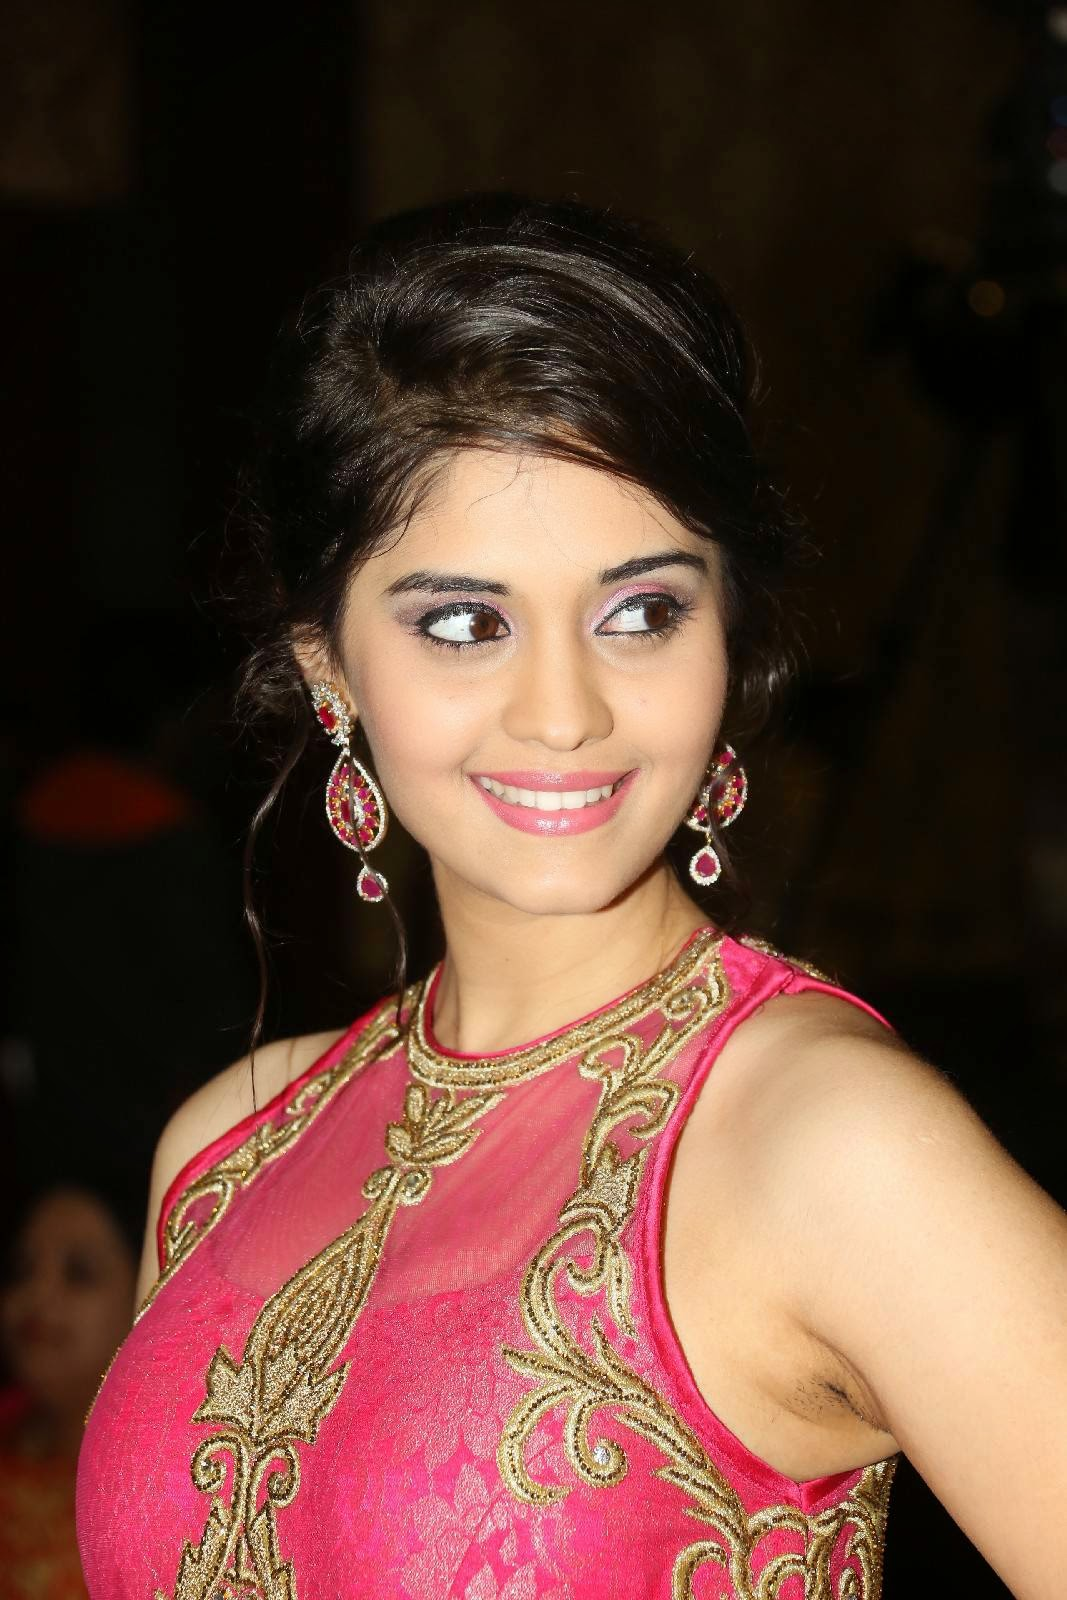 Surabhi Photo In Long Dress  Hot Bollywood Actress-8802